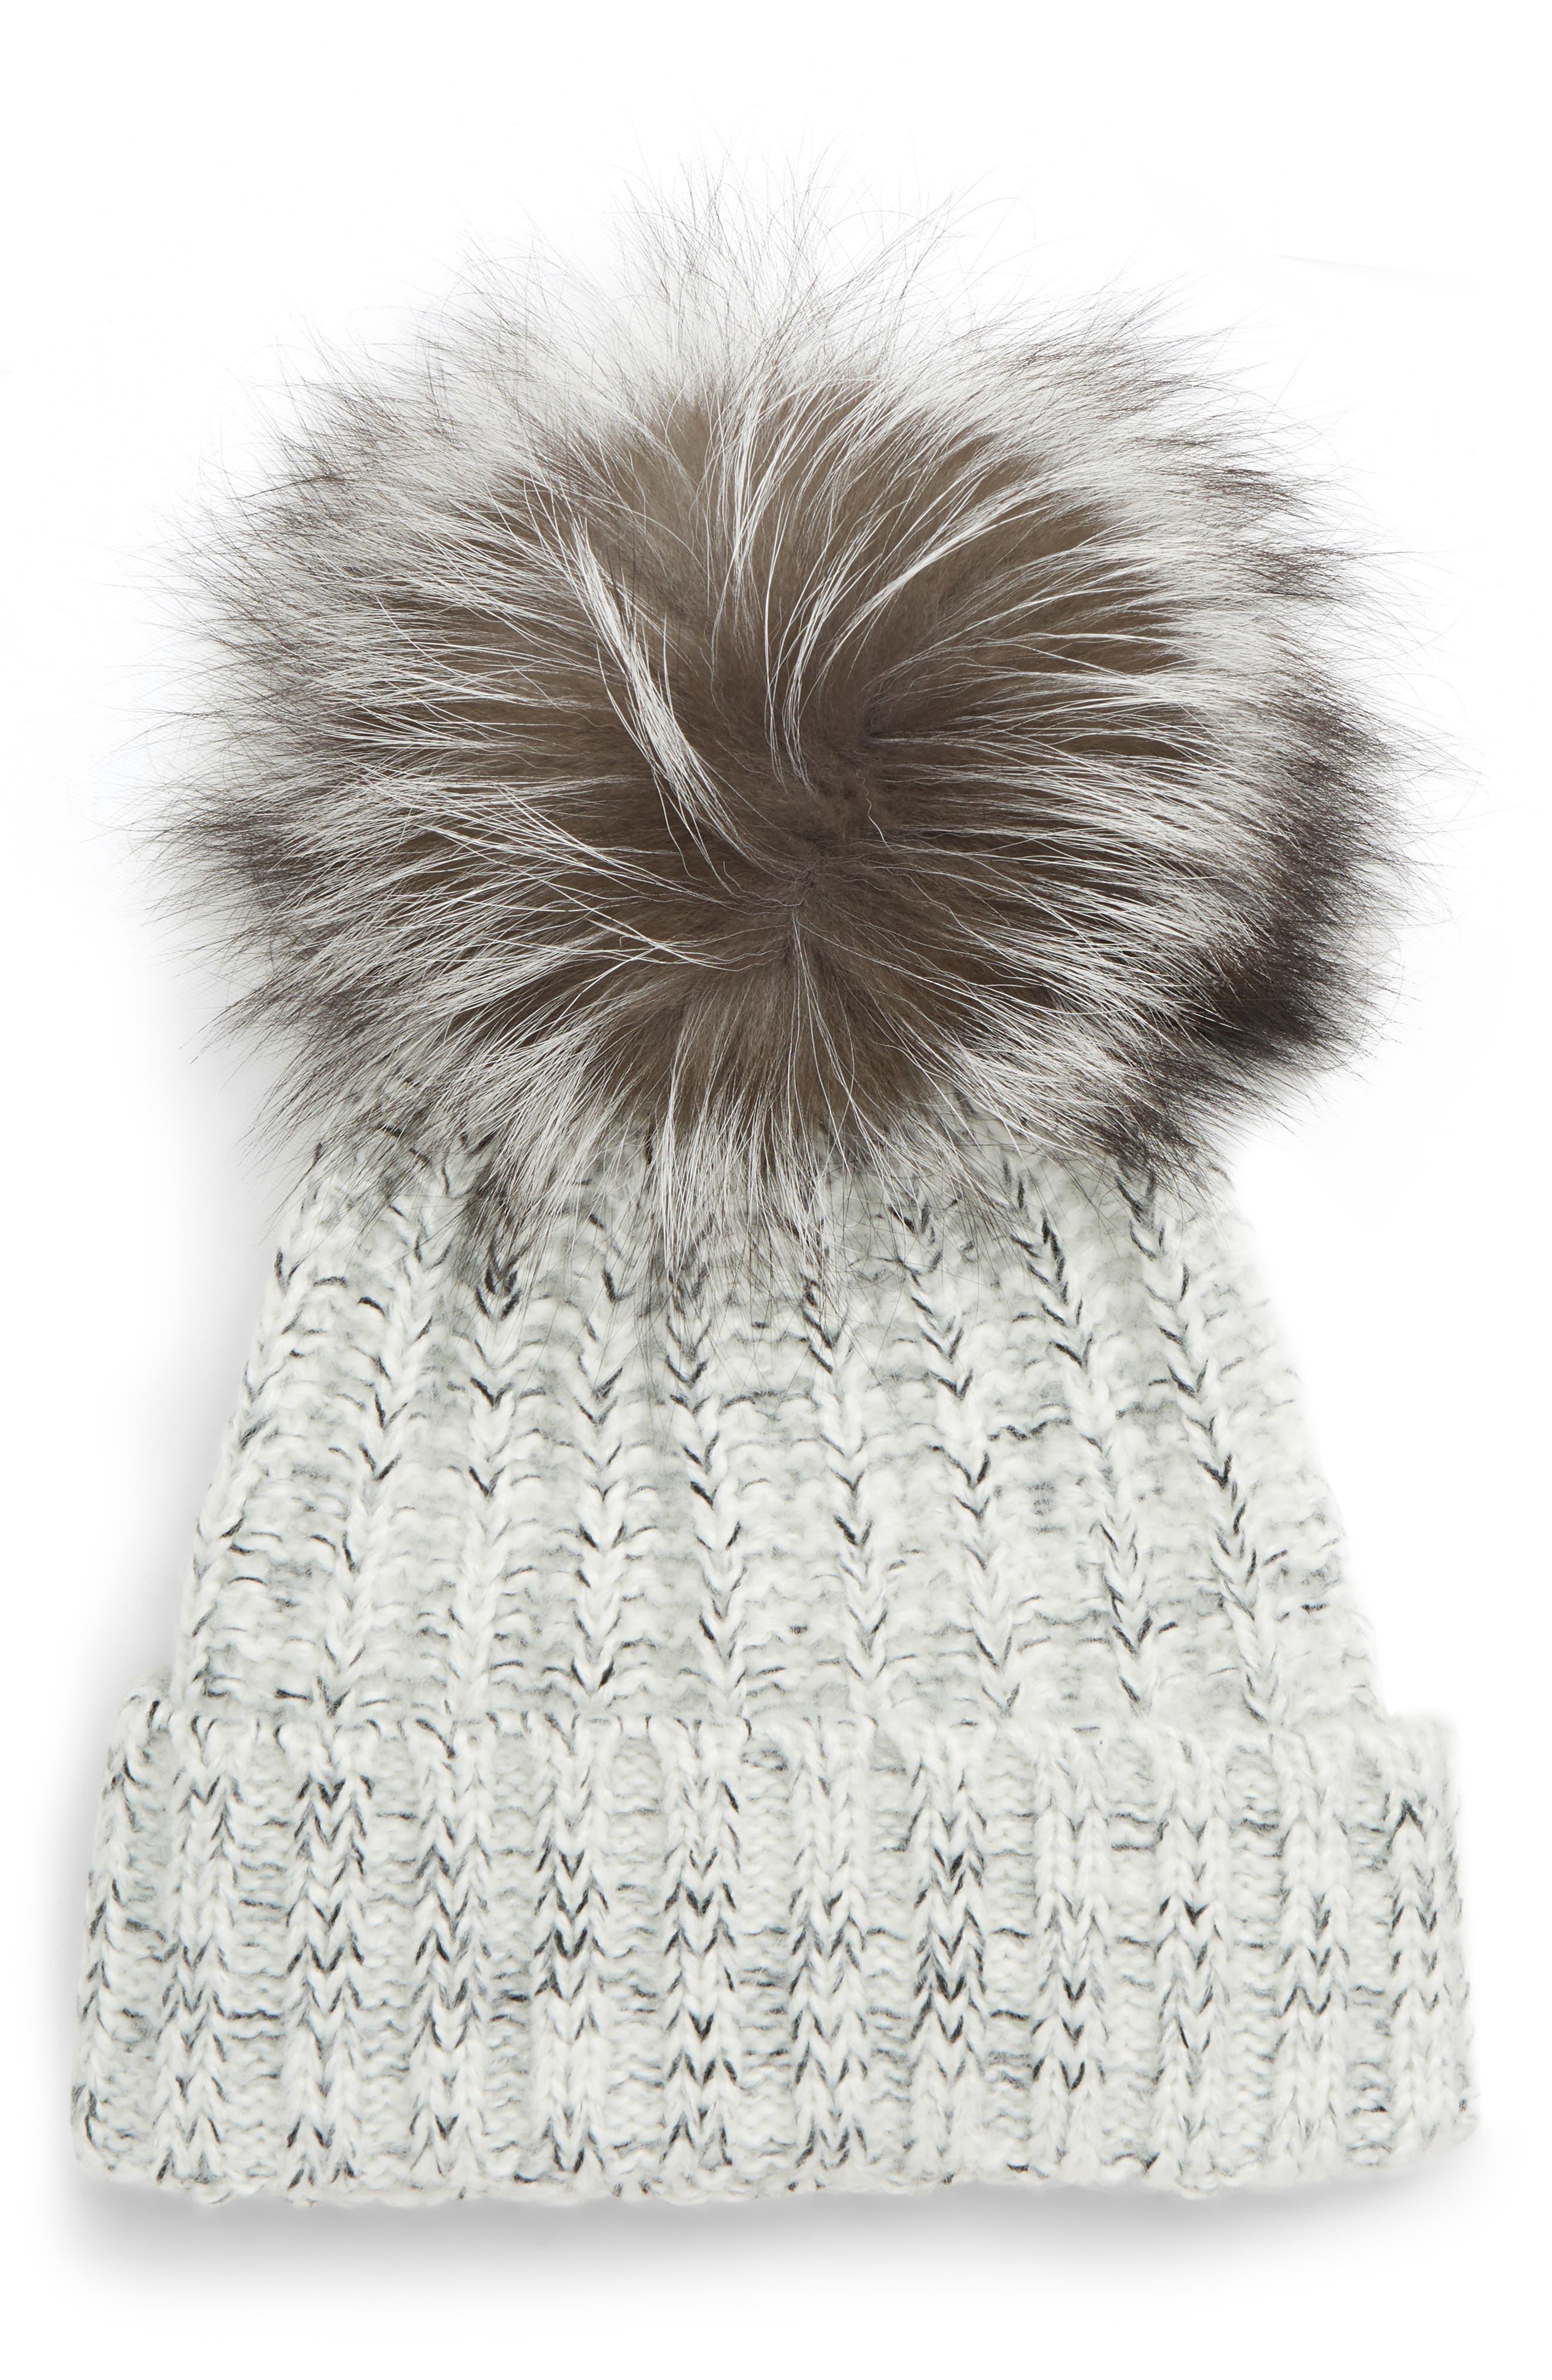 edf7c2c4d67 Fur (Genuine) Hats for Women